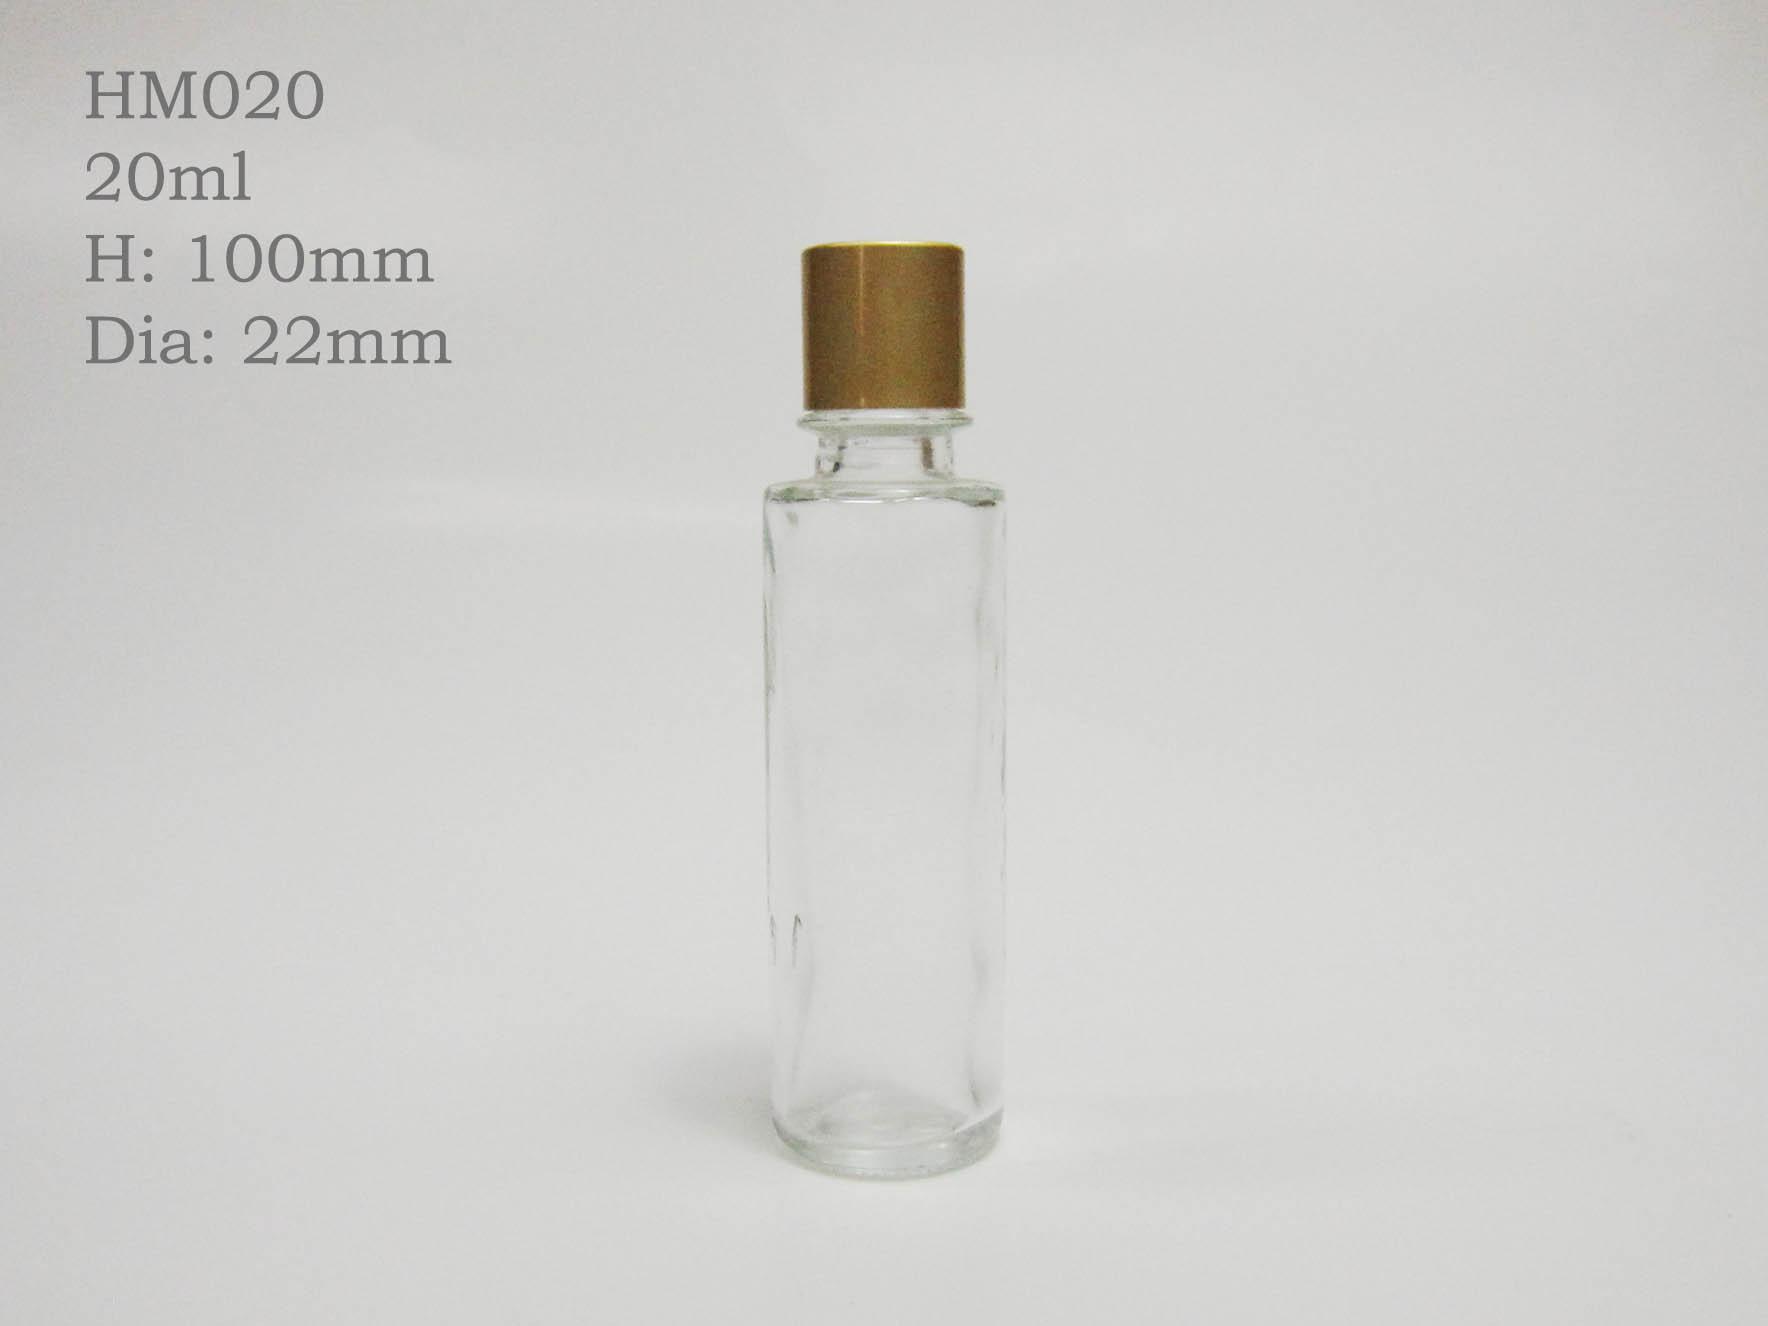 hm020